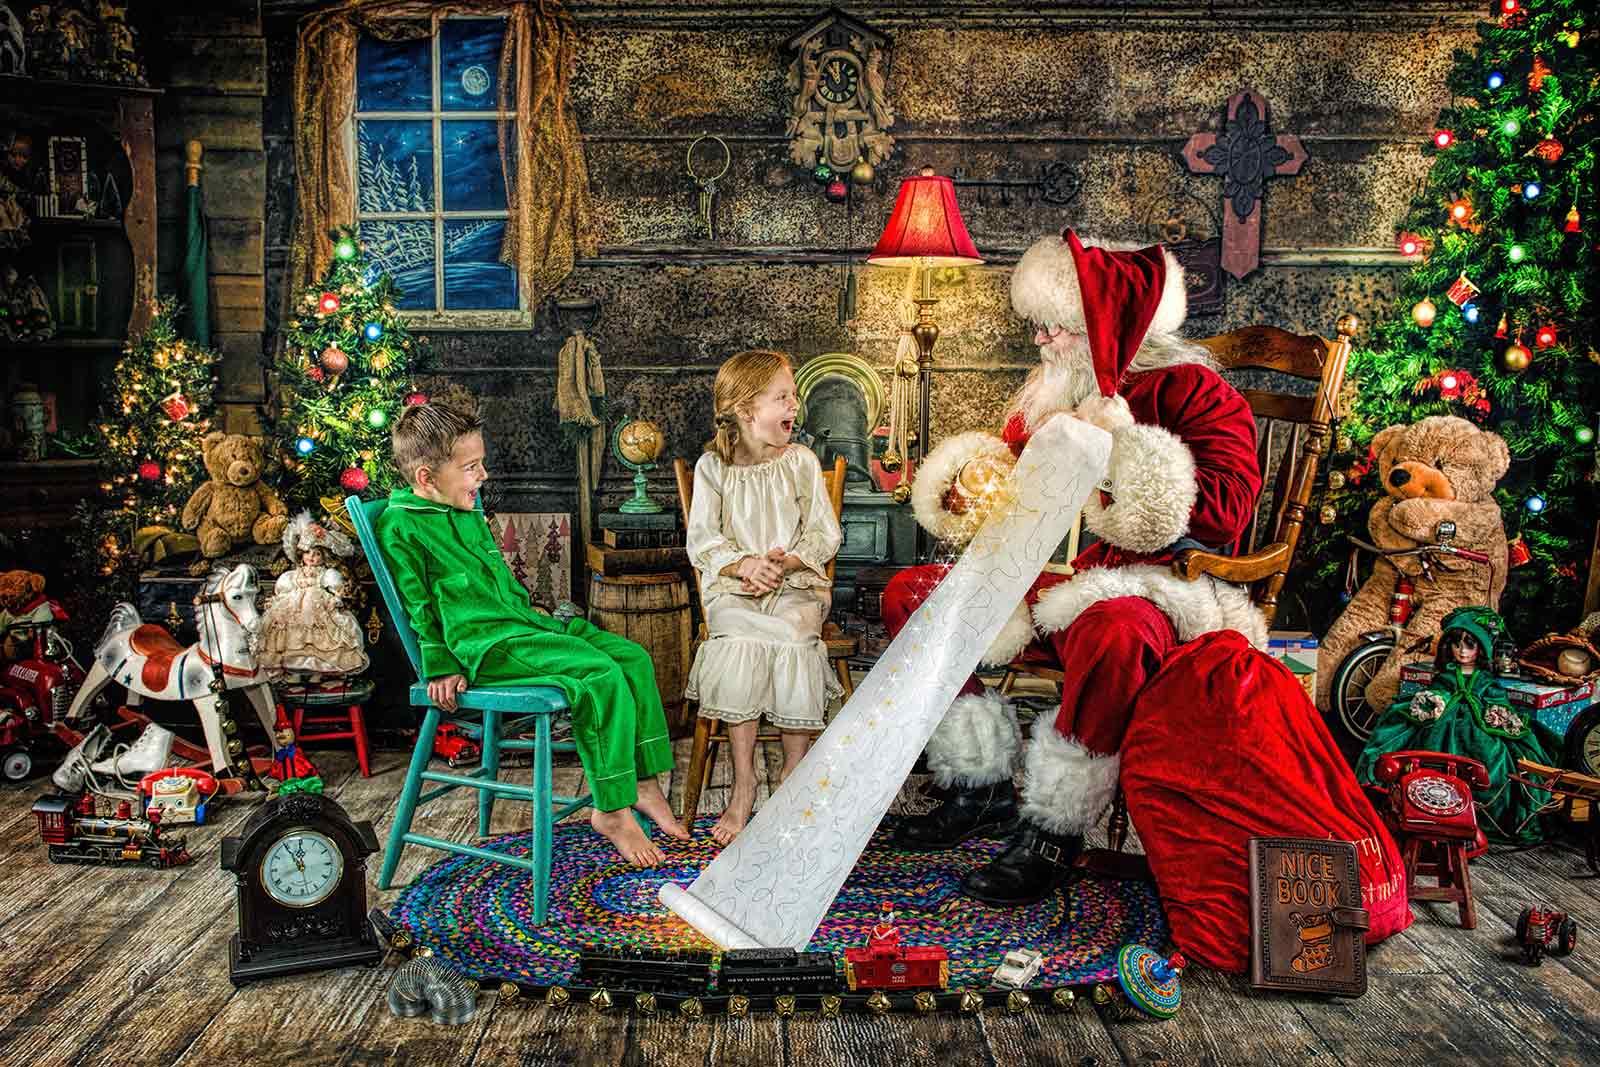 013_Magic-of-Santa-Anna-Thielen-Photography